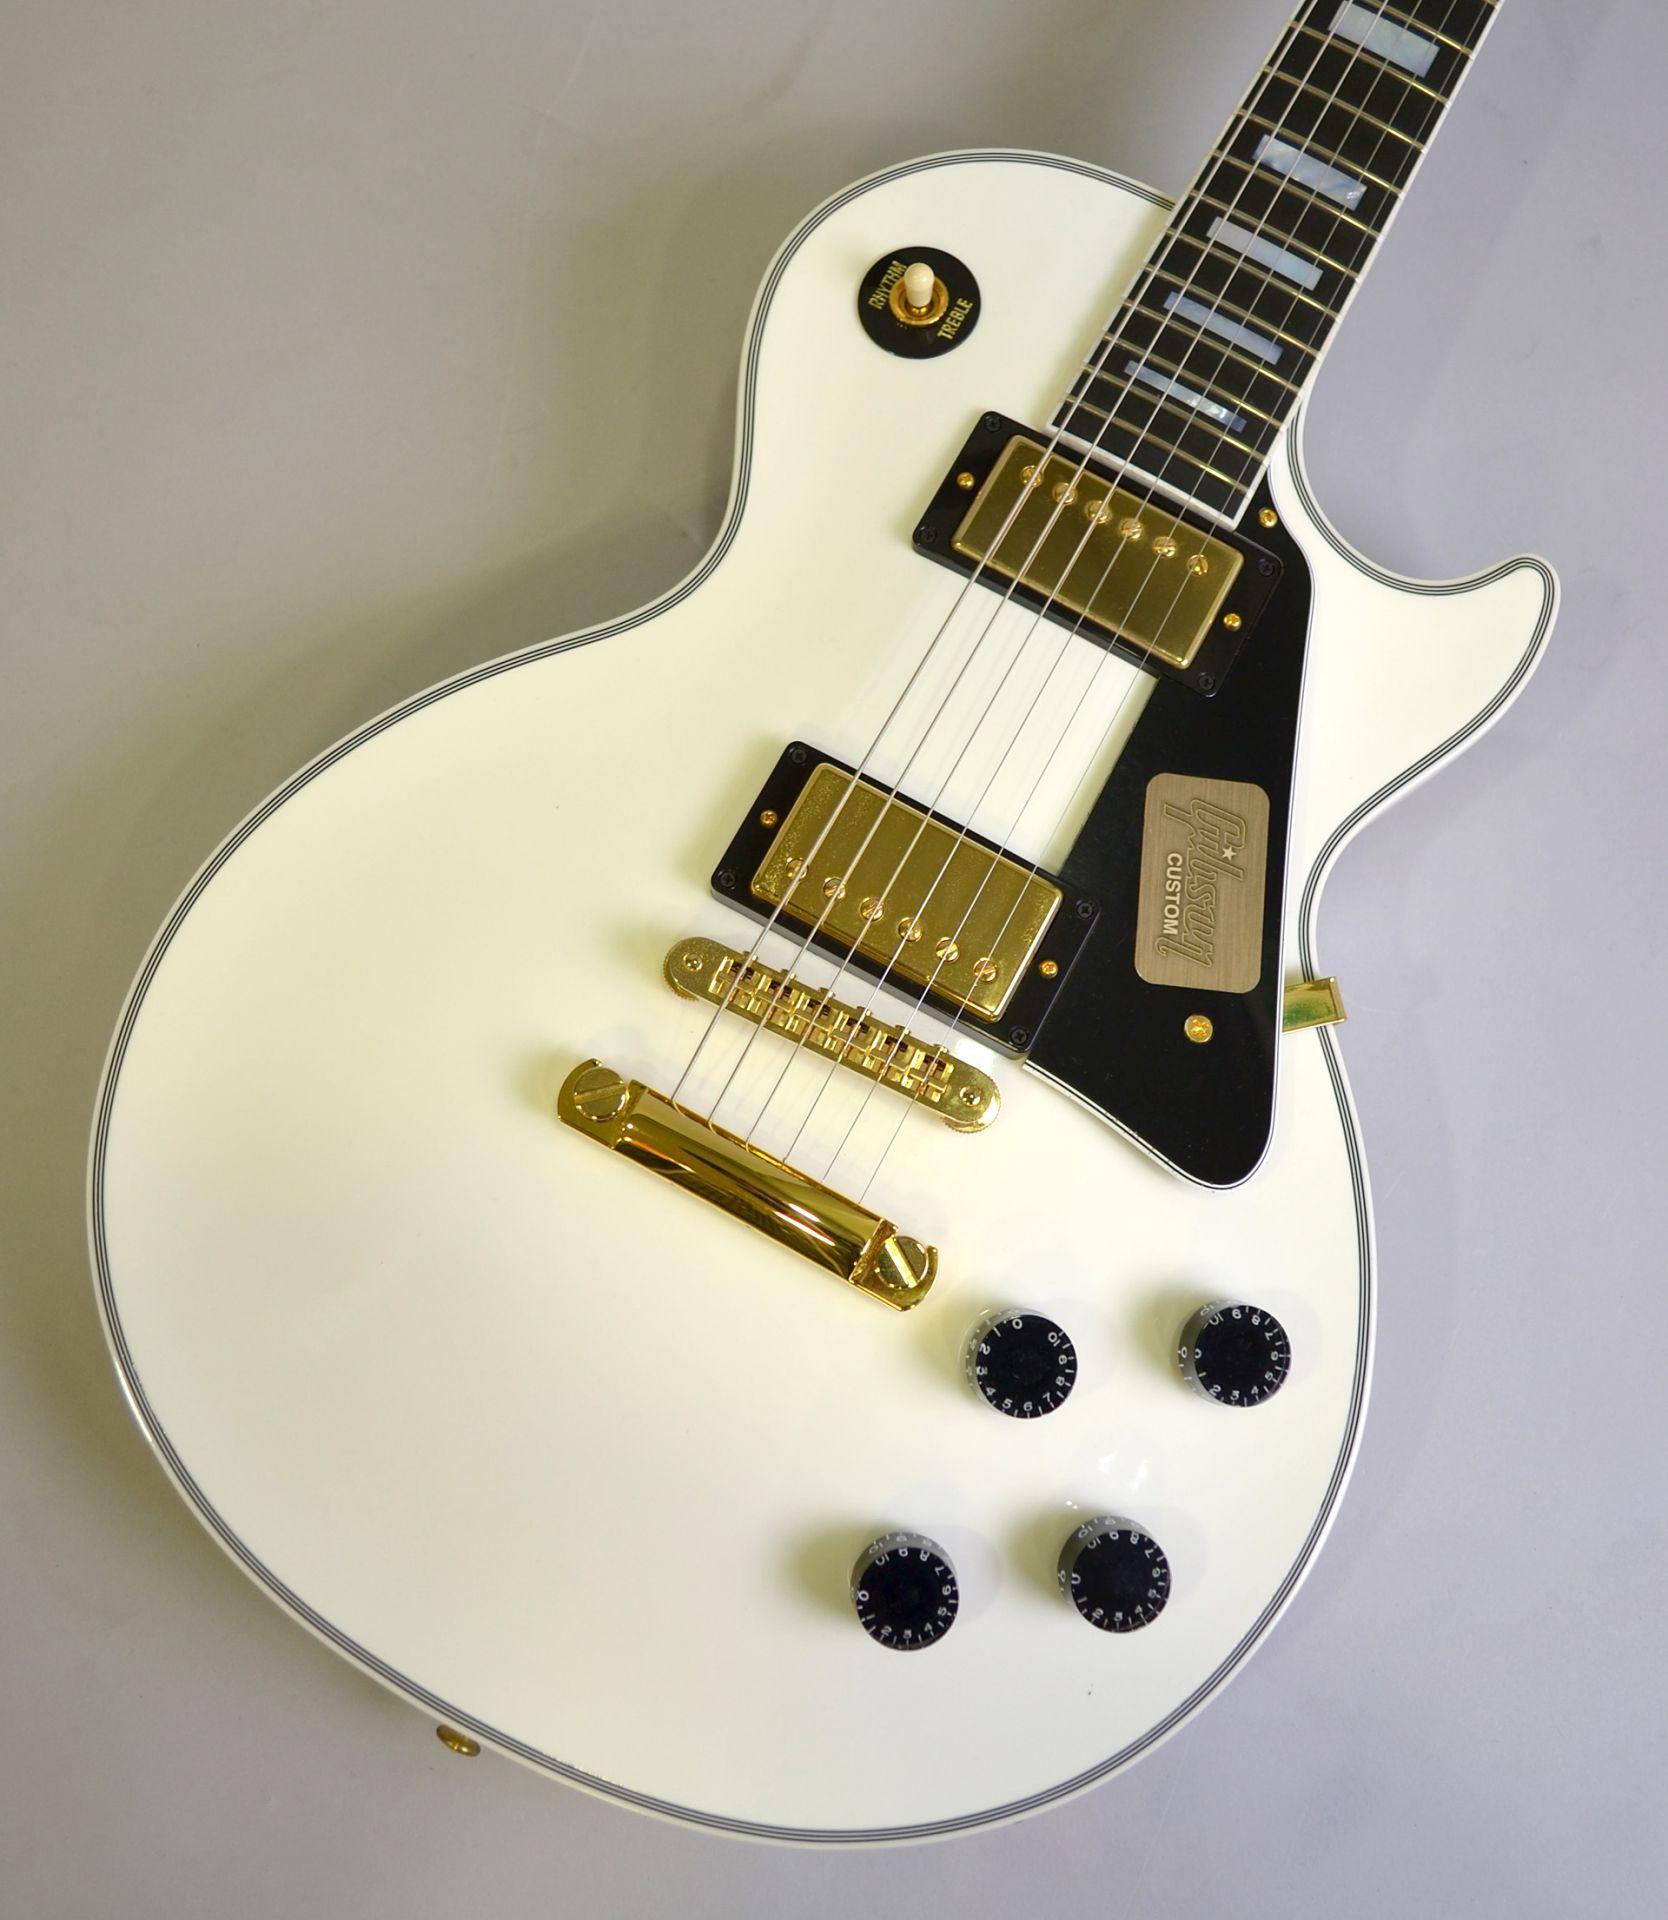 Les Paul Custom【Alpine White】のボディトップ-アップ画像